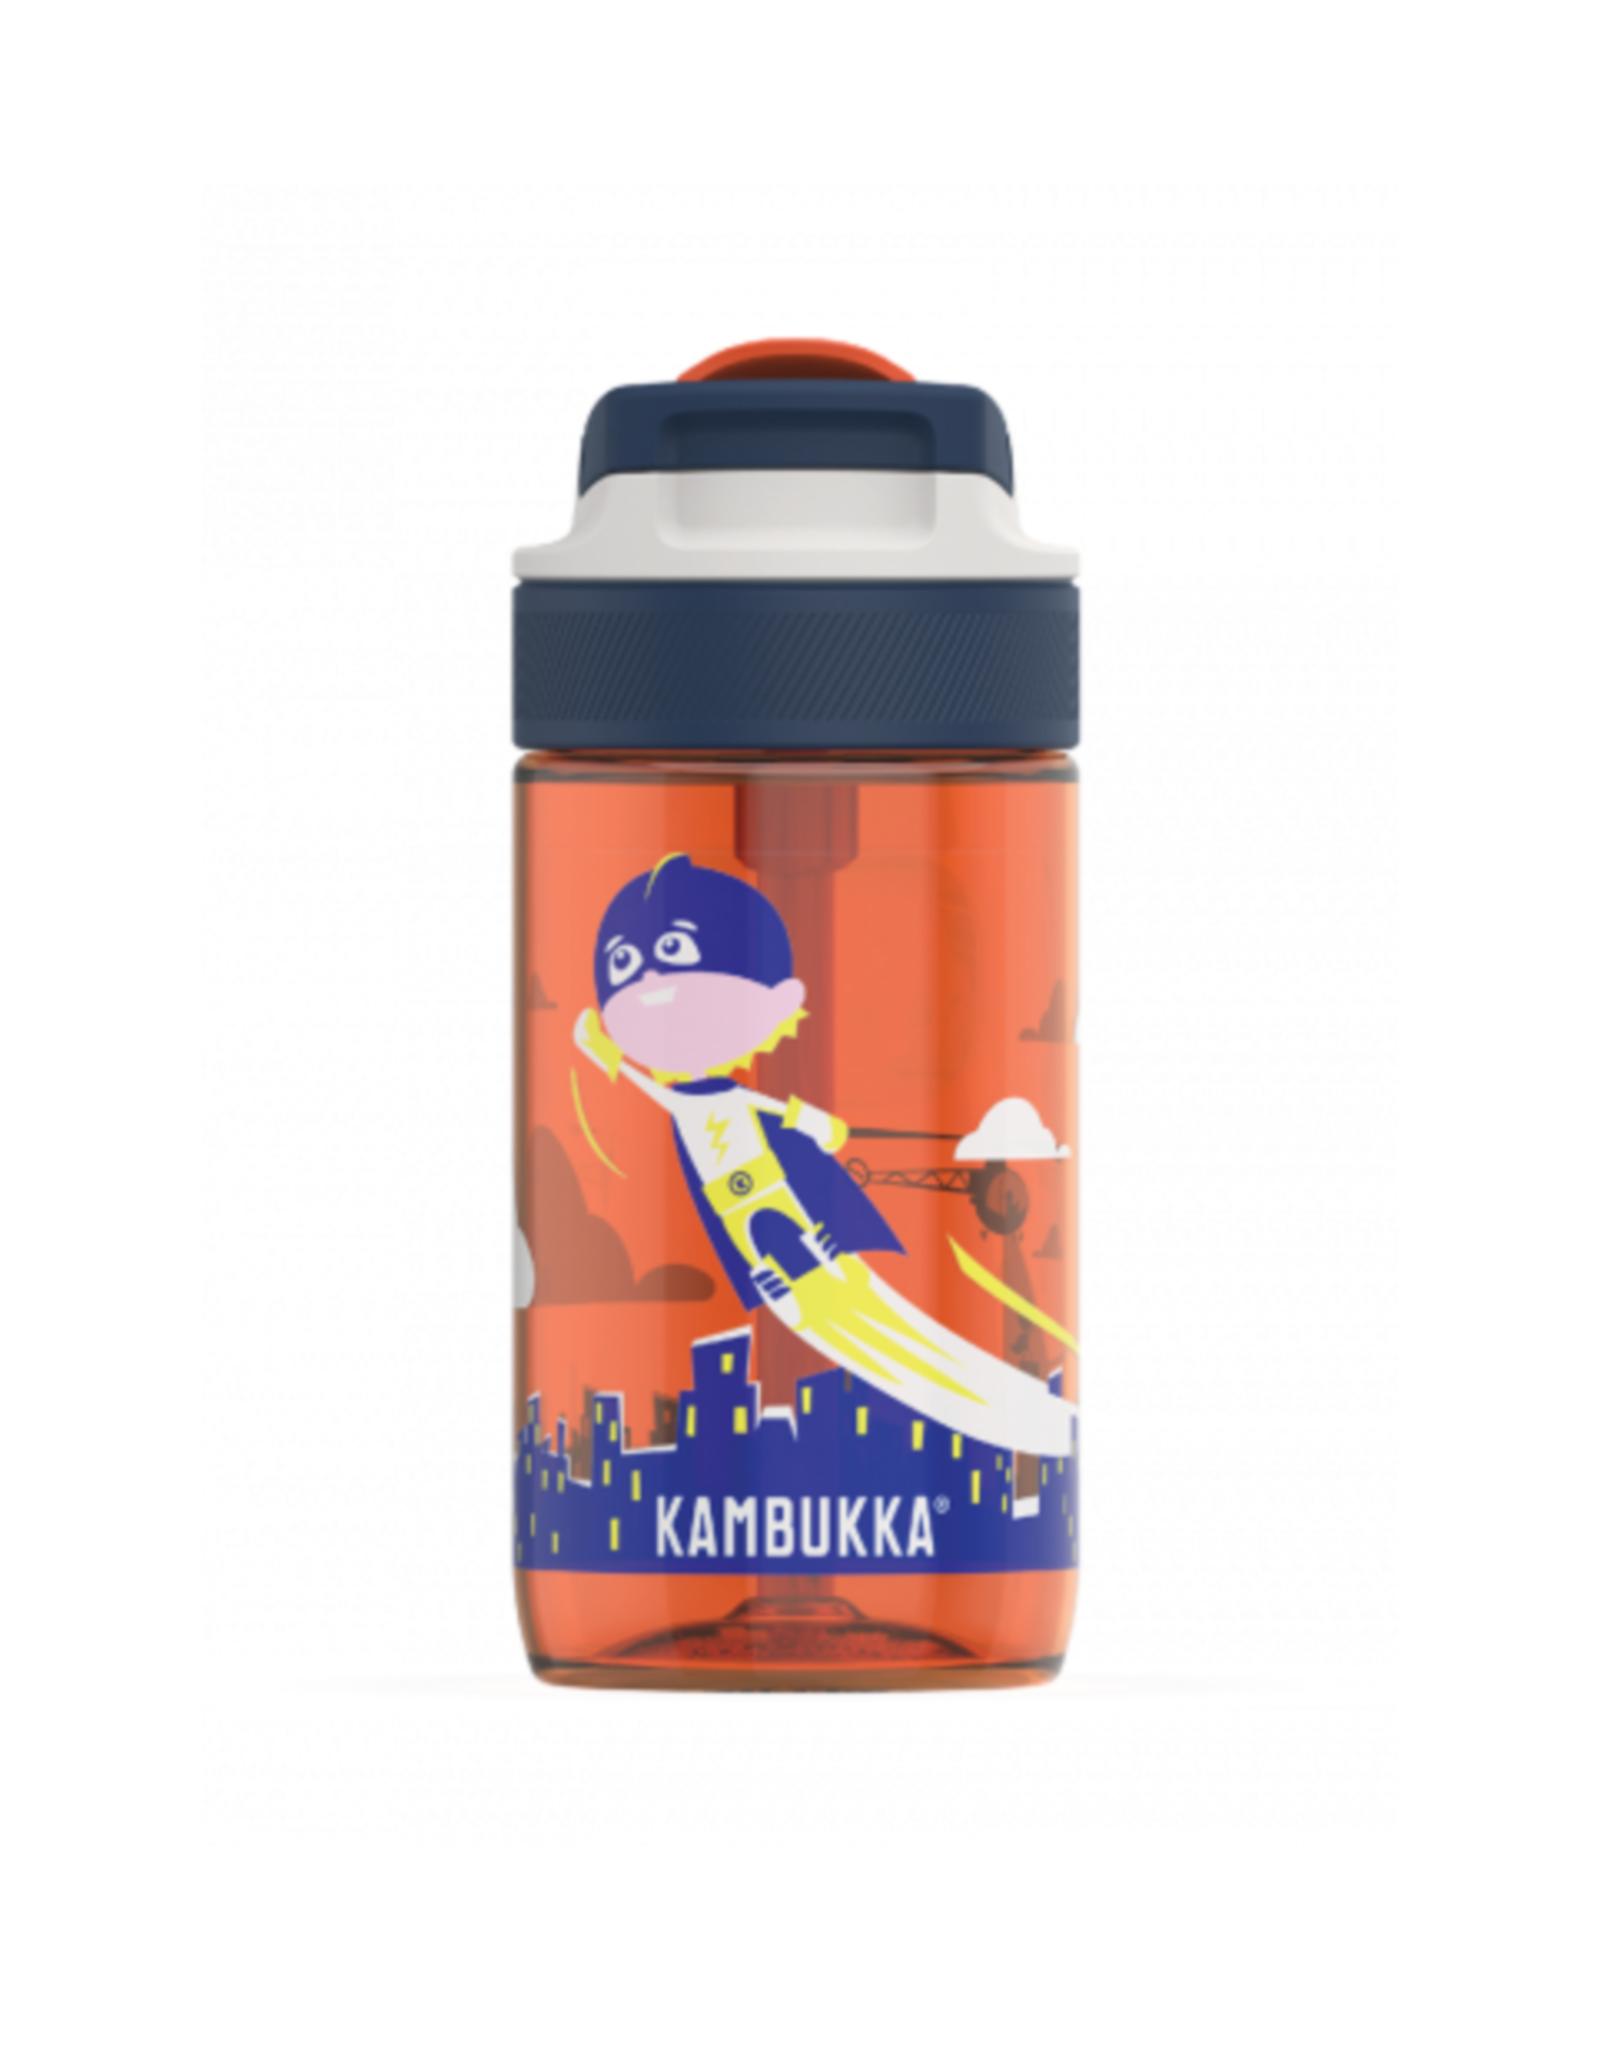 Kambukka Lagoon Flying superboy - 400 ml